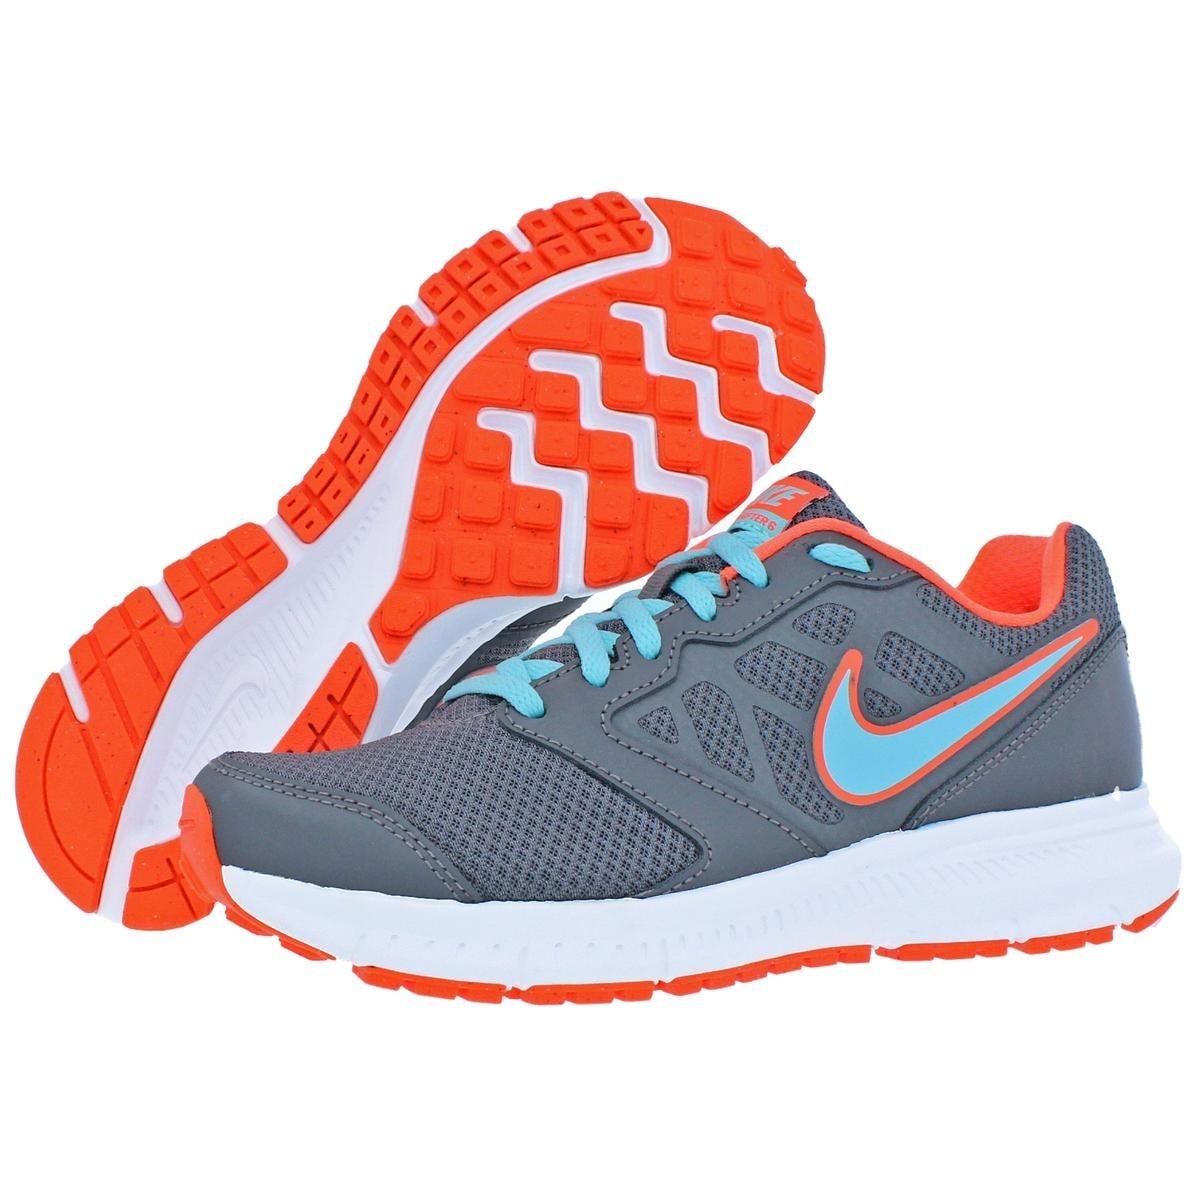 Invalidez Serpiente con las manos en la masa  Shop Nike Womens Downshifter 6 Running, Cross Training Shoes Road Runner  Phylon - Overstock - 22670936